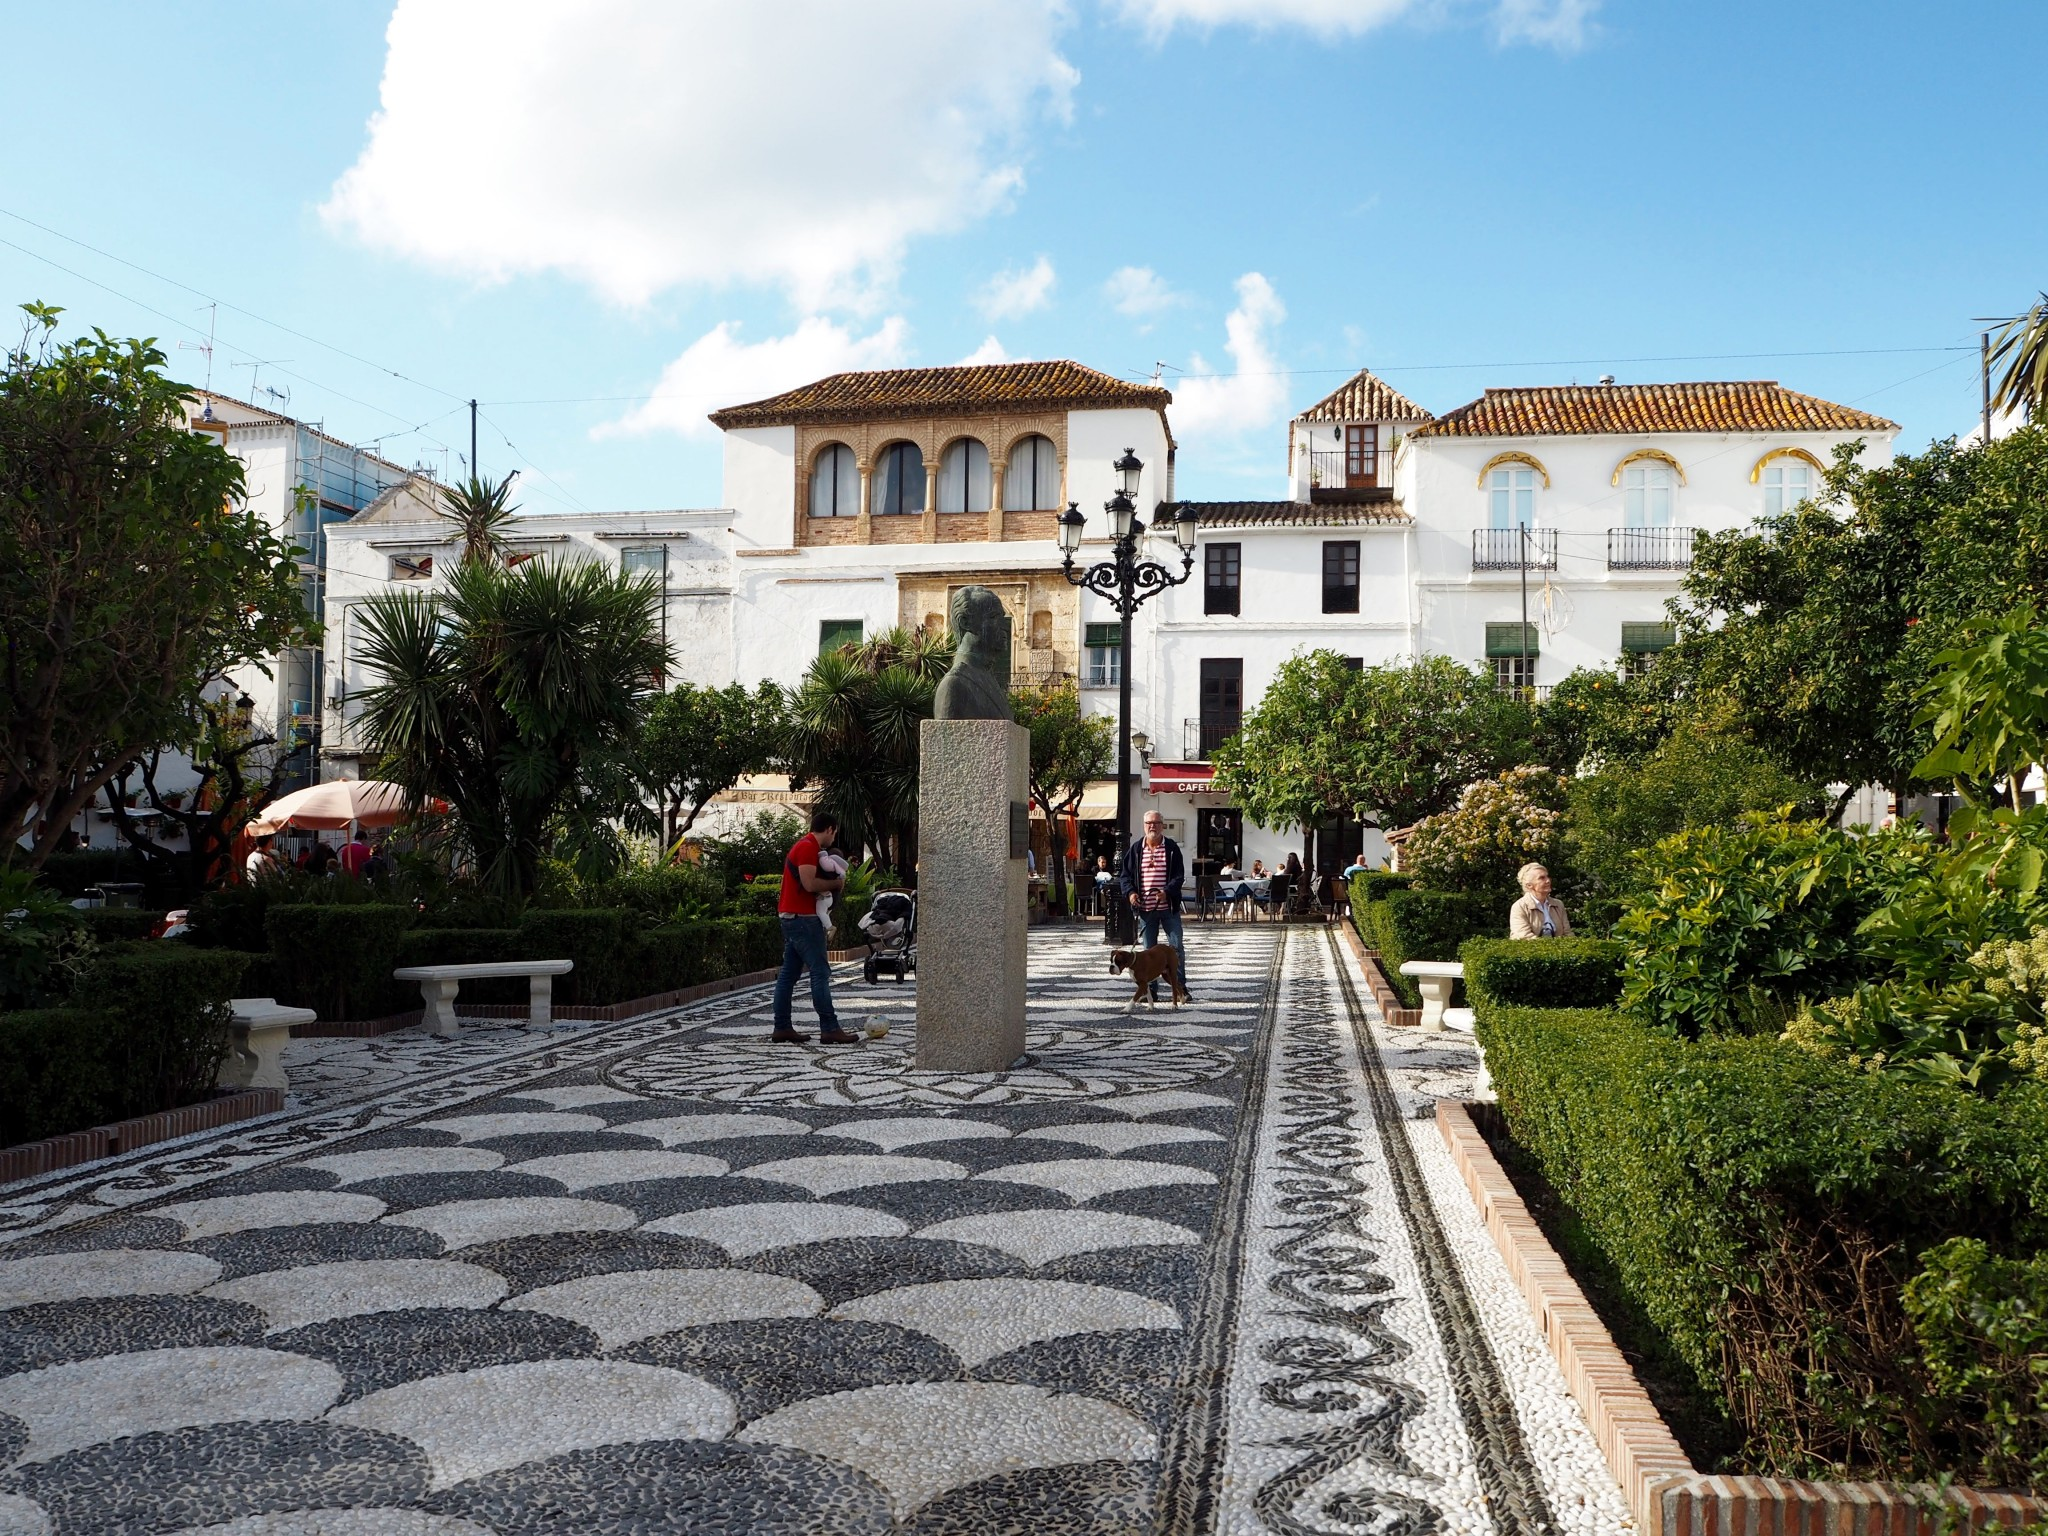 Aurinkorannikko Marbella vanha kaupunki